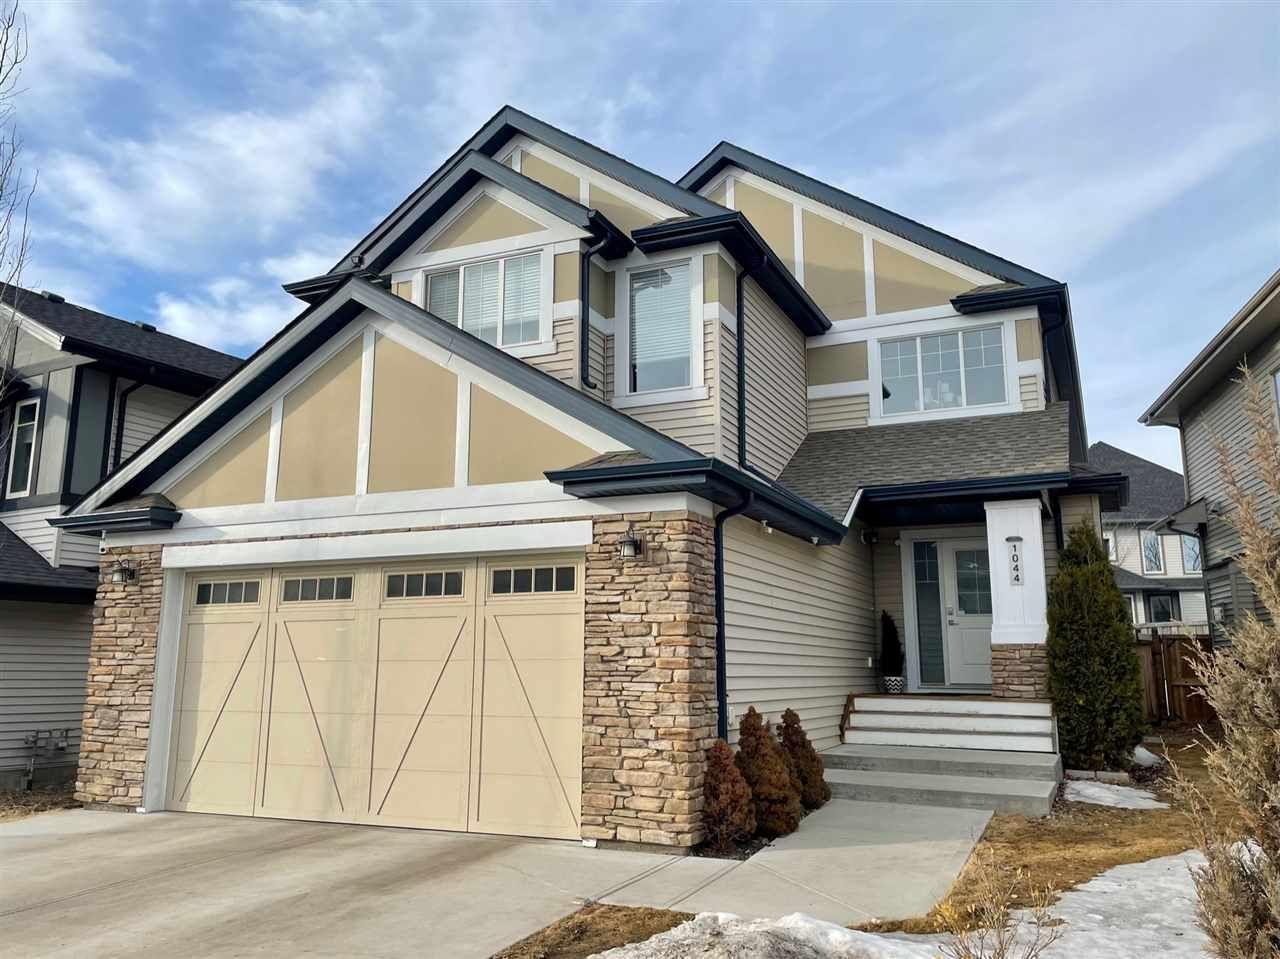 Main Photo: 1044 ARMITAGE Crescent in Edmonton: Zone 56 House for sale : MLS®# E4232773